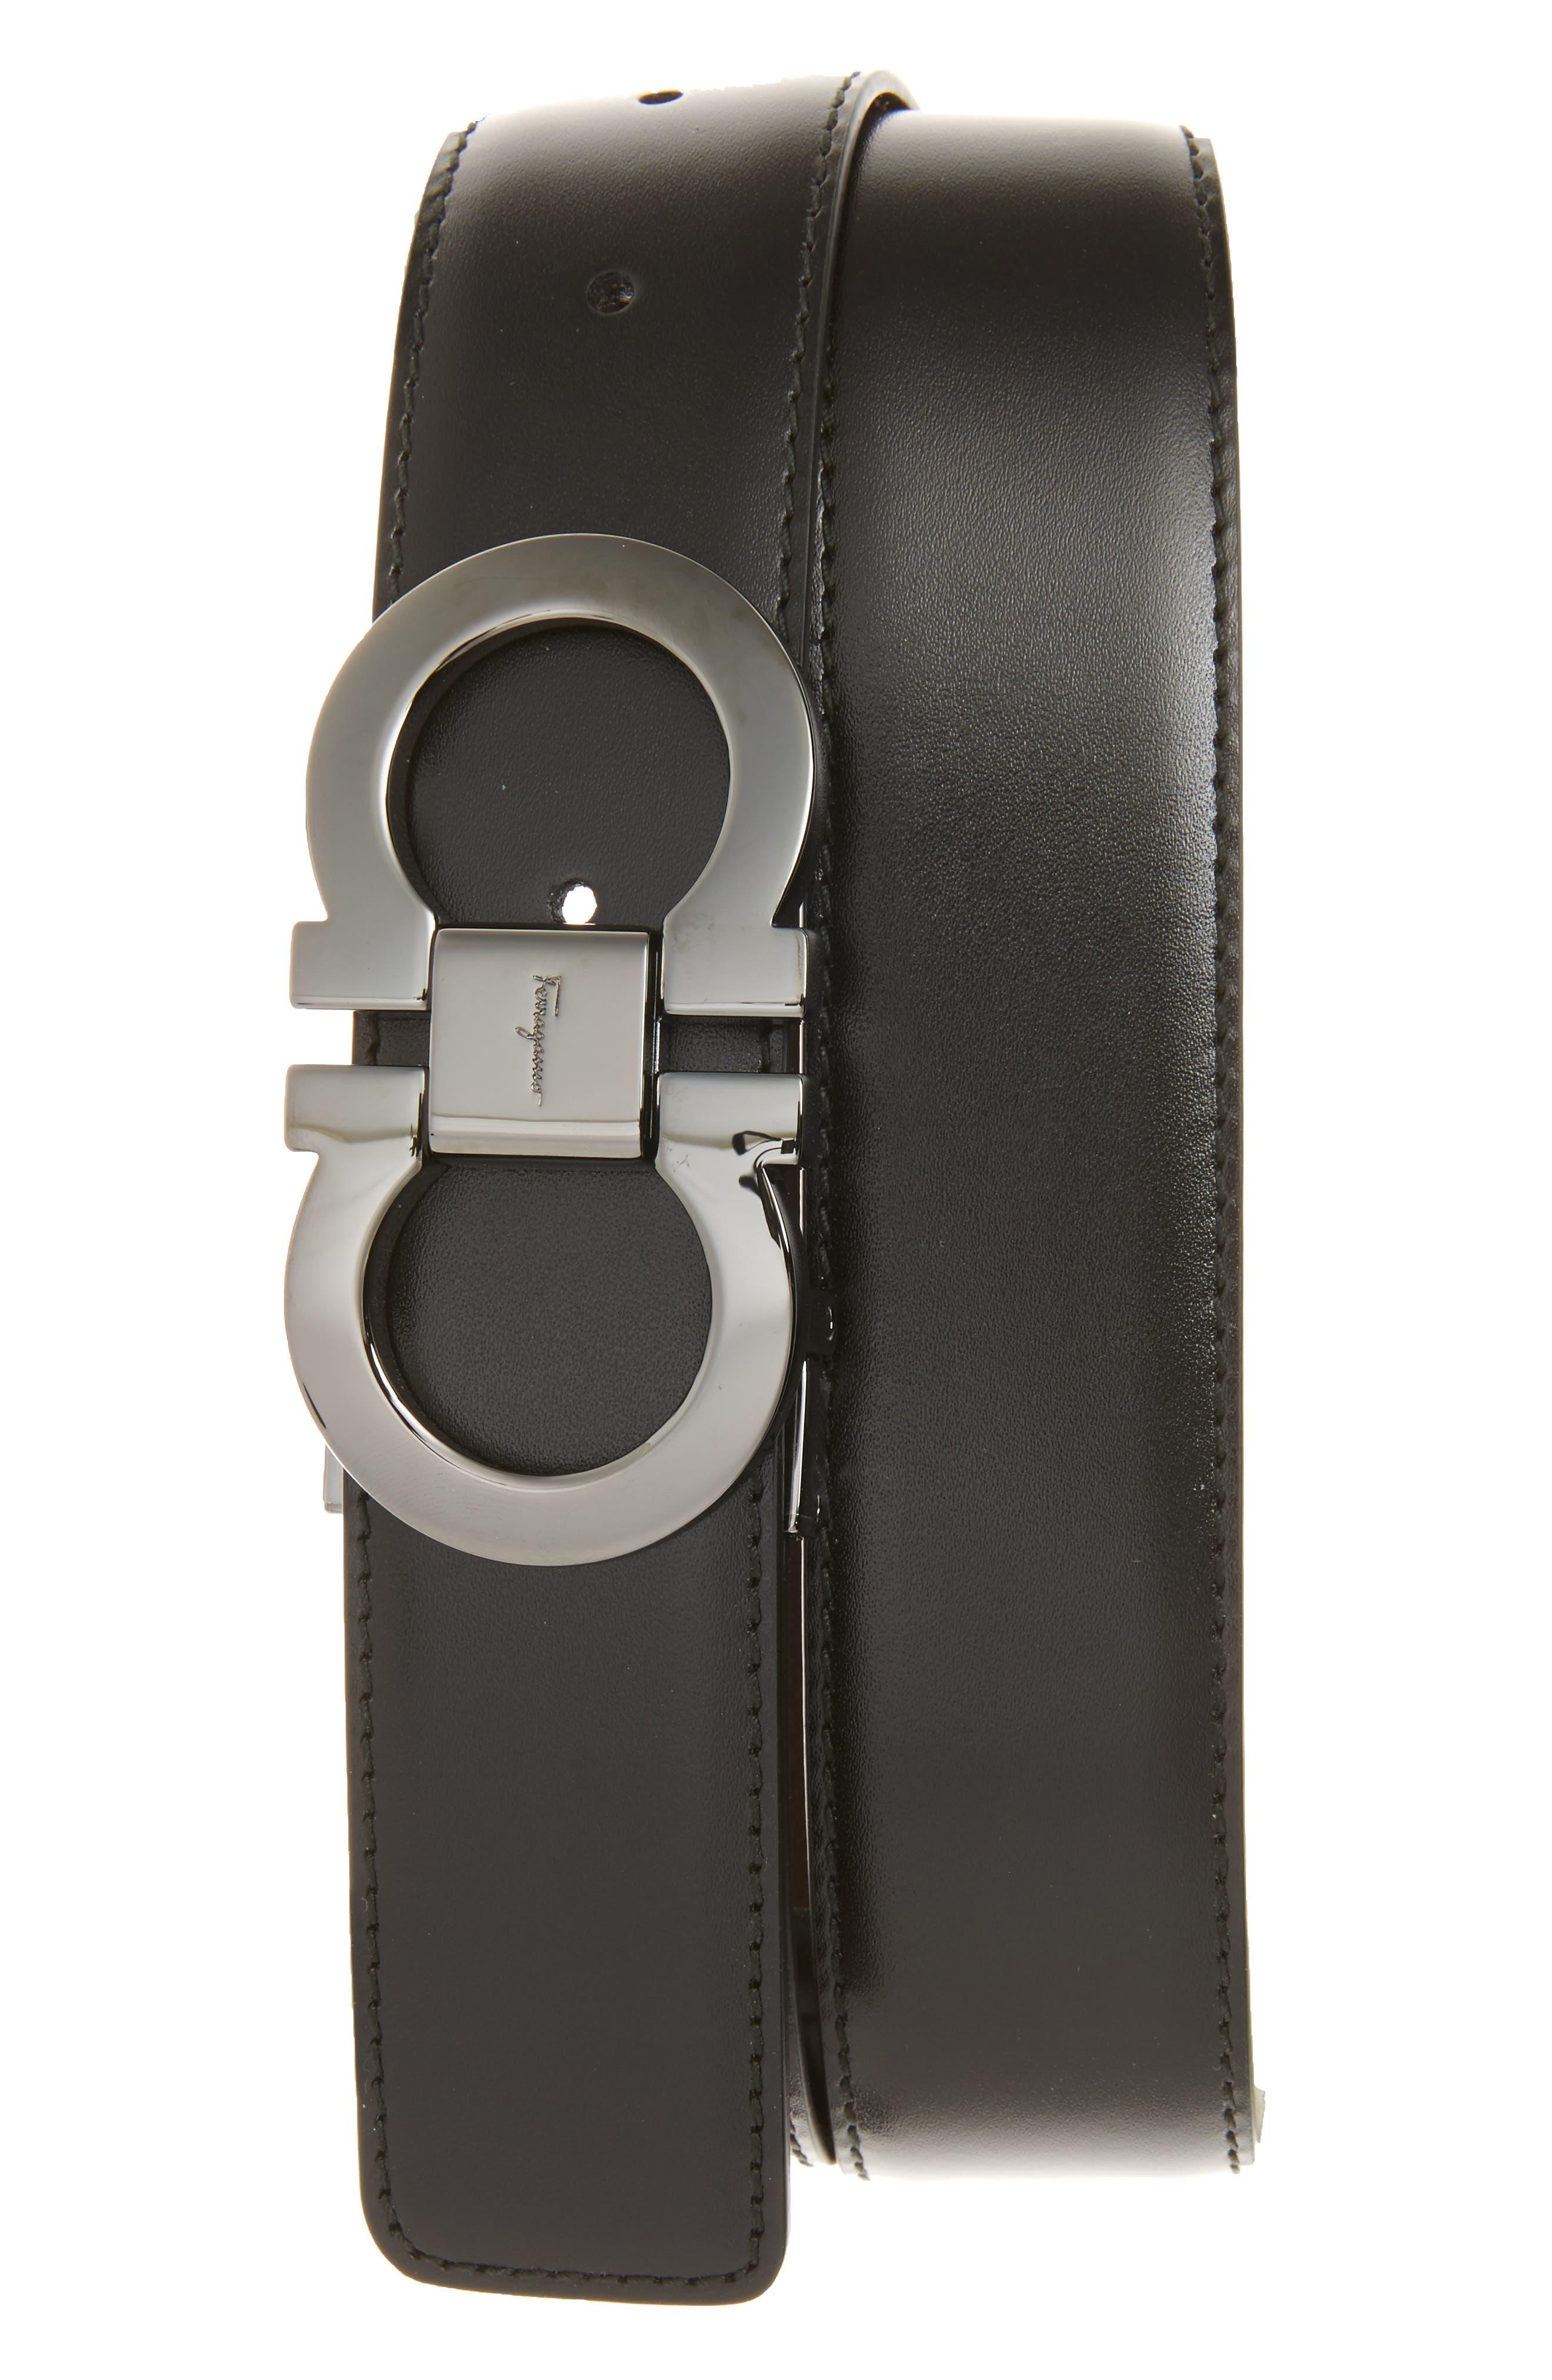 SALVATORE FERRAGAMO, Reversible Leather Belt, Main thumbnail 1, color, BLACK/ AUBURN